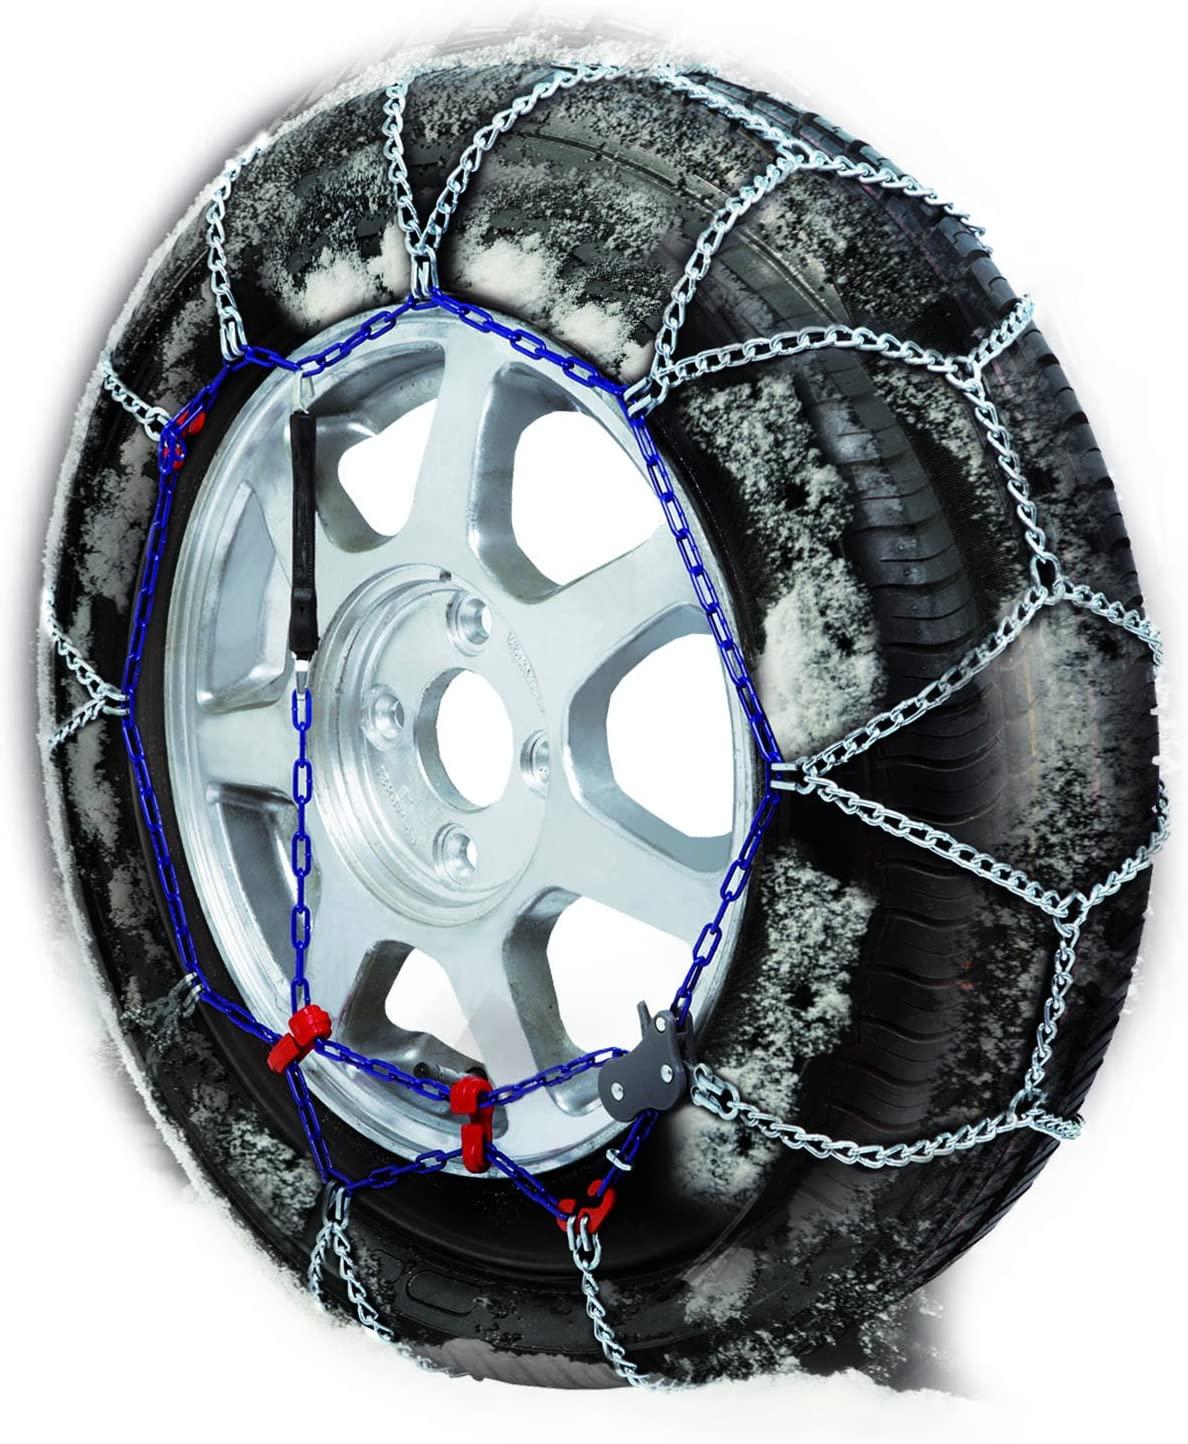 "Gulf 76011 ""X7"" - Cadenas de nieve 7 mm para coche, Talla 065"